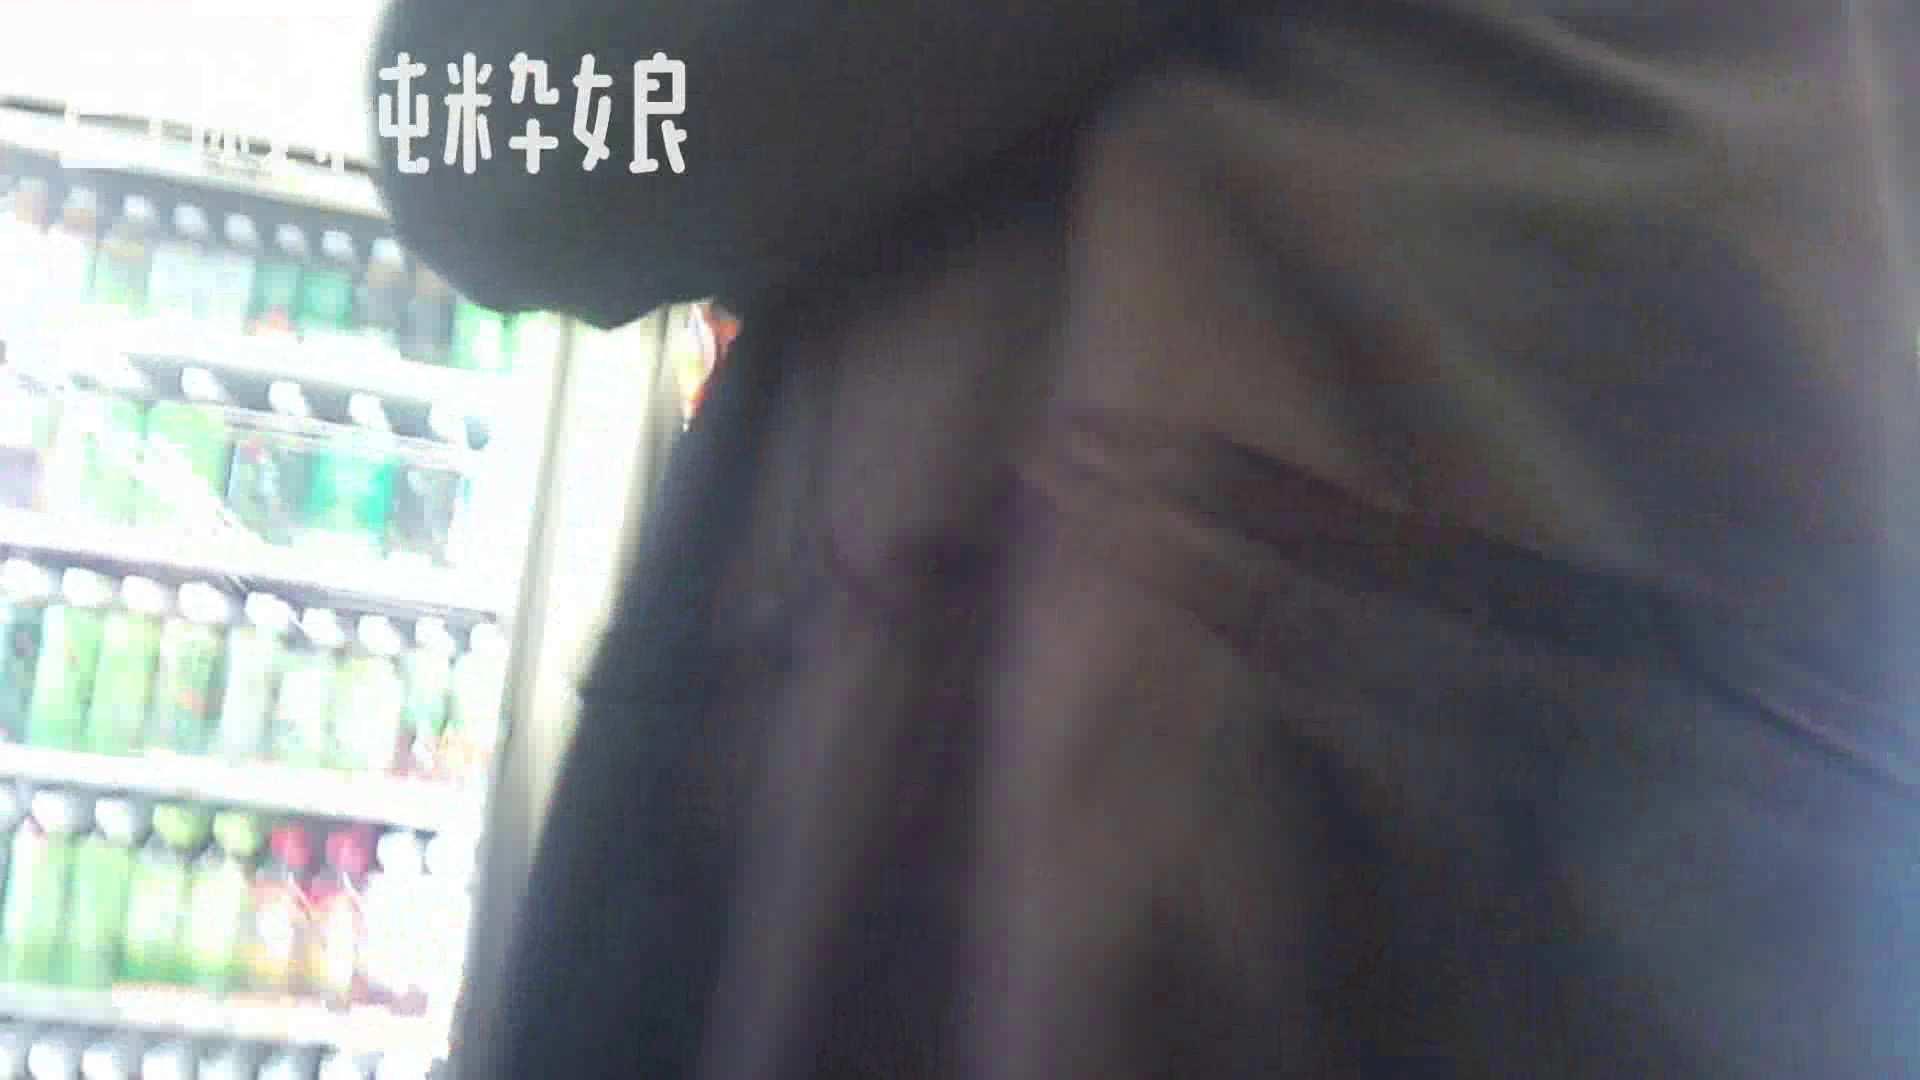 Gカップ21歳純粋嬢第2弾Vol.5 美女OL | 学校内で  78連発 7